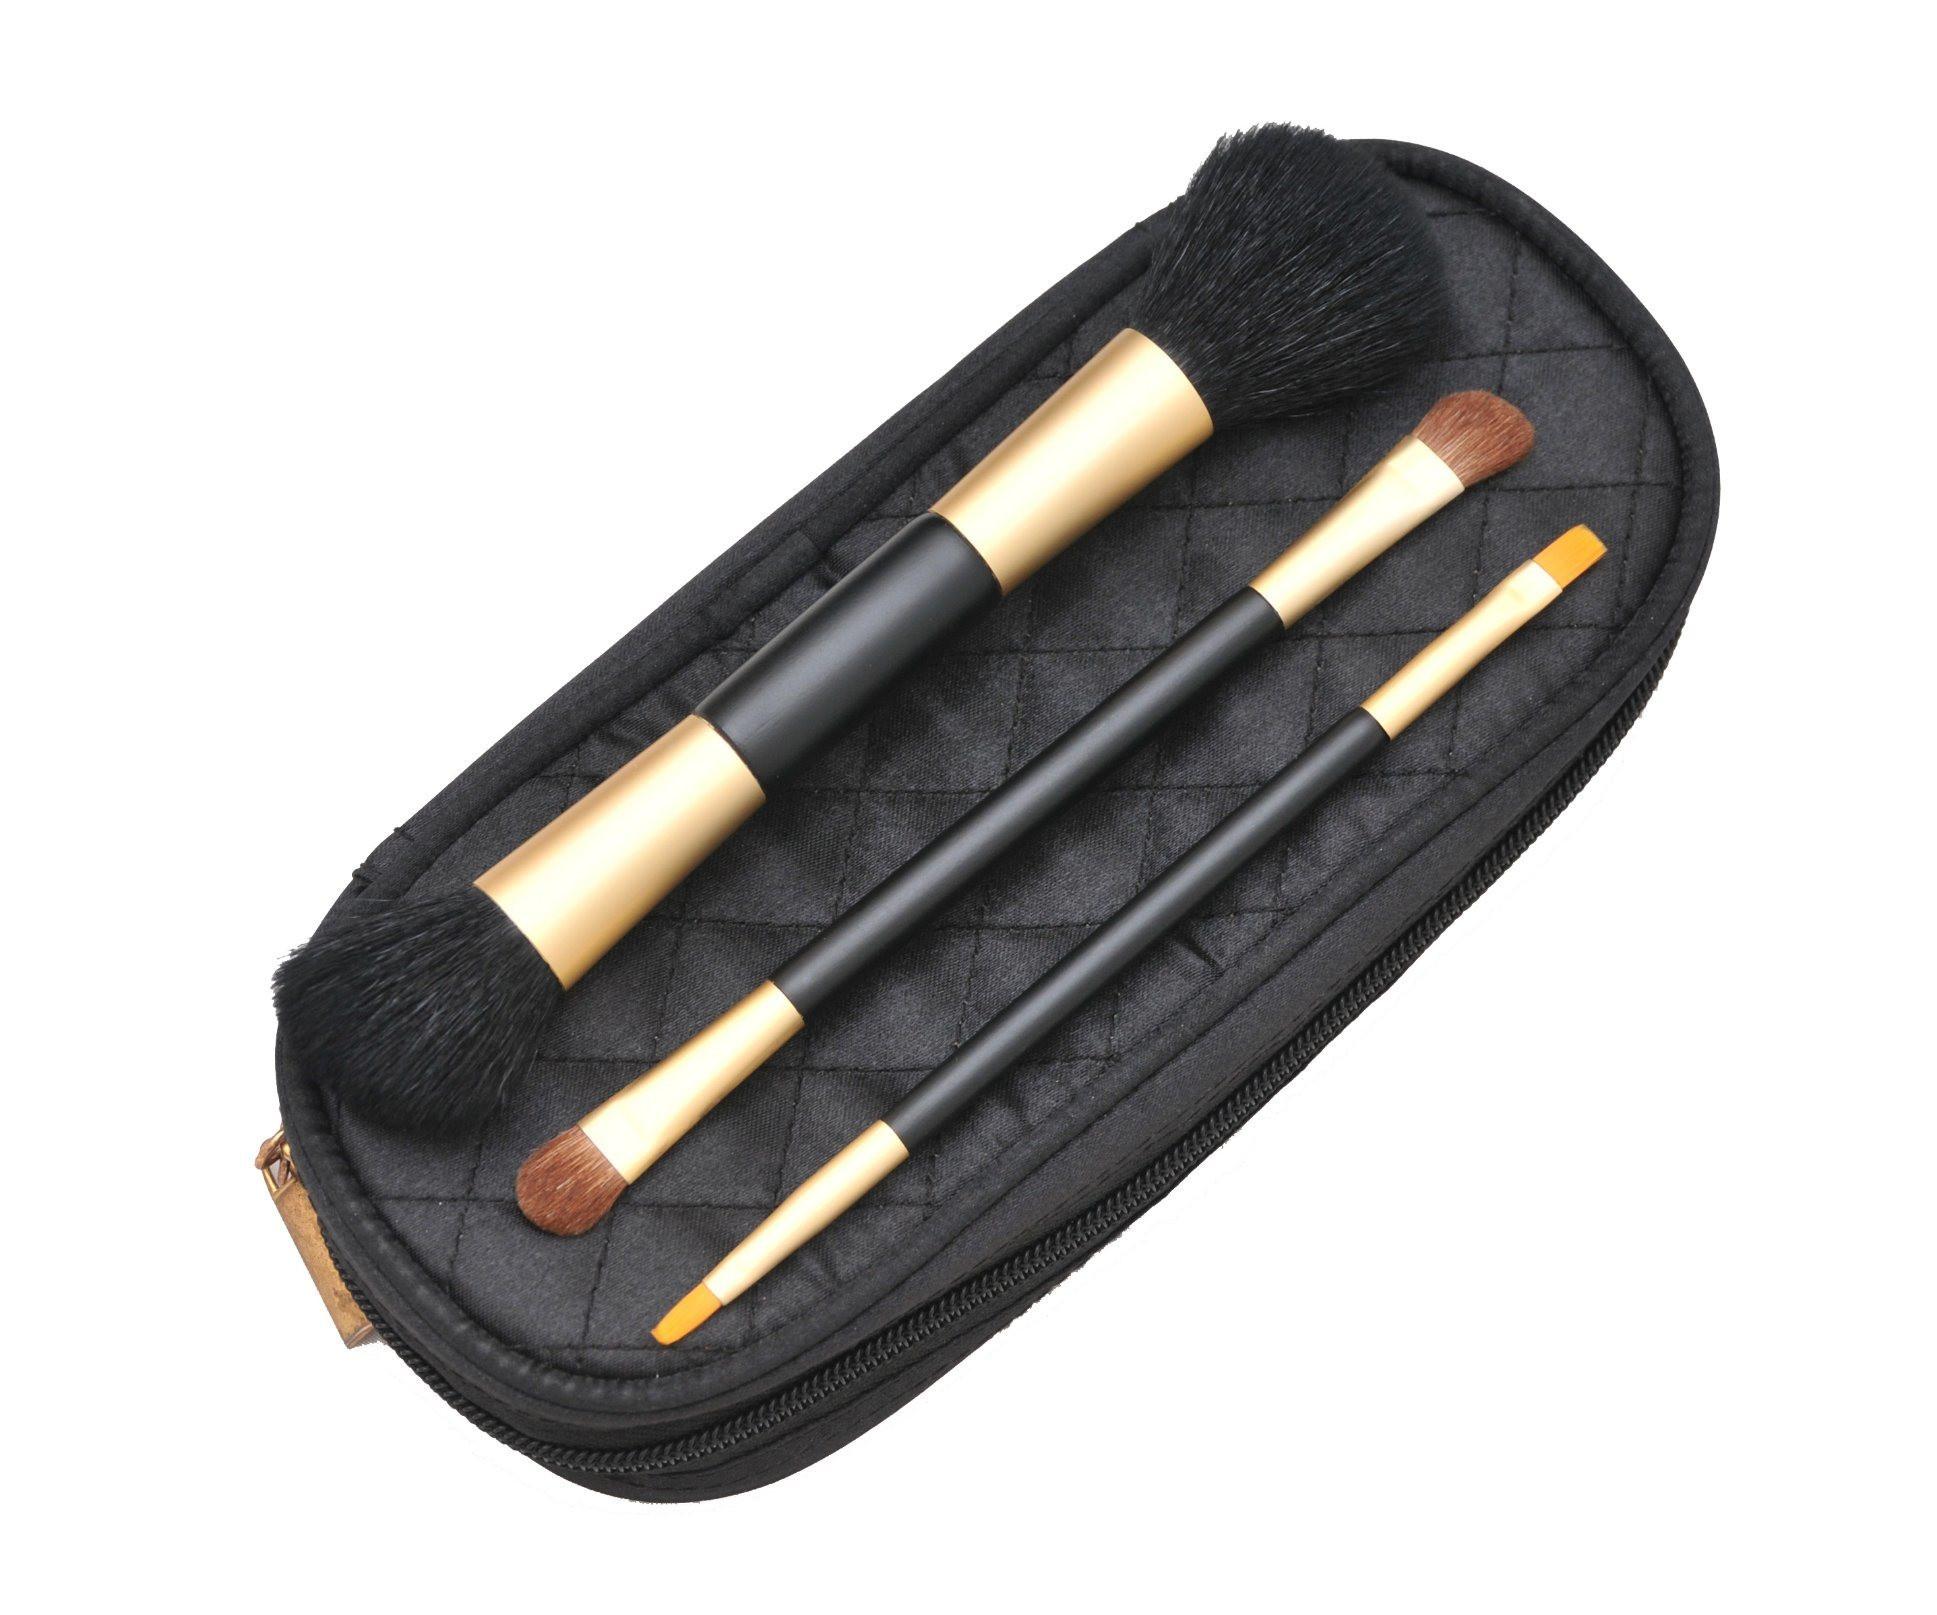 3PCS Travel Brush Set Dual Ends Brush Golden Ferrule with Zip Pouch